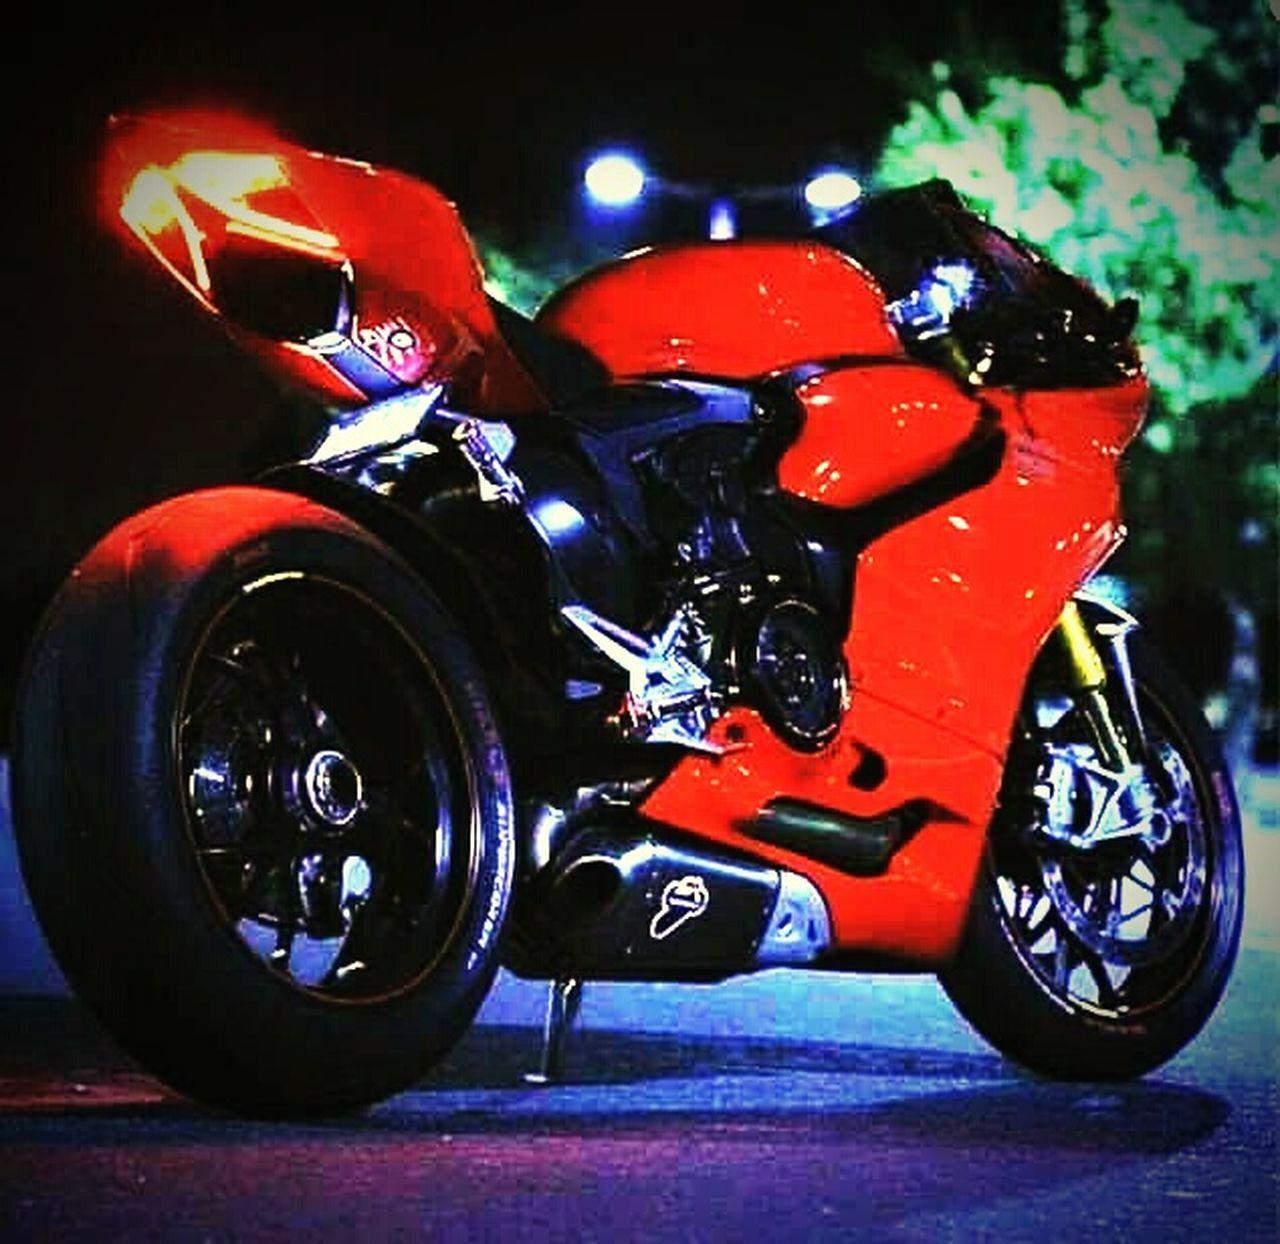 motorcycle, red, motorsport, crash helmet, motorcycle racing, speed, land vehicle, sports race, helmet, headwear, outdoors, close-up, night, auto racing, no people